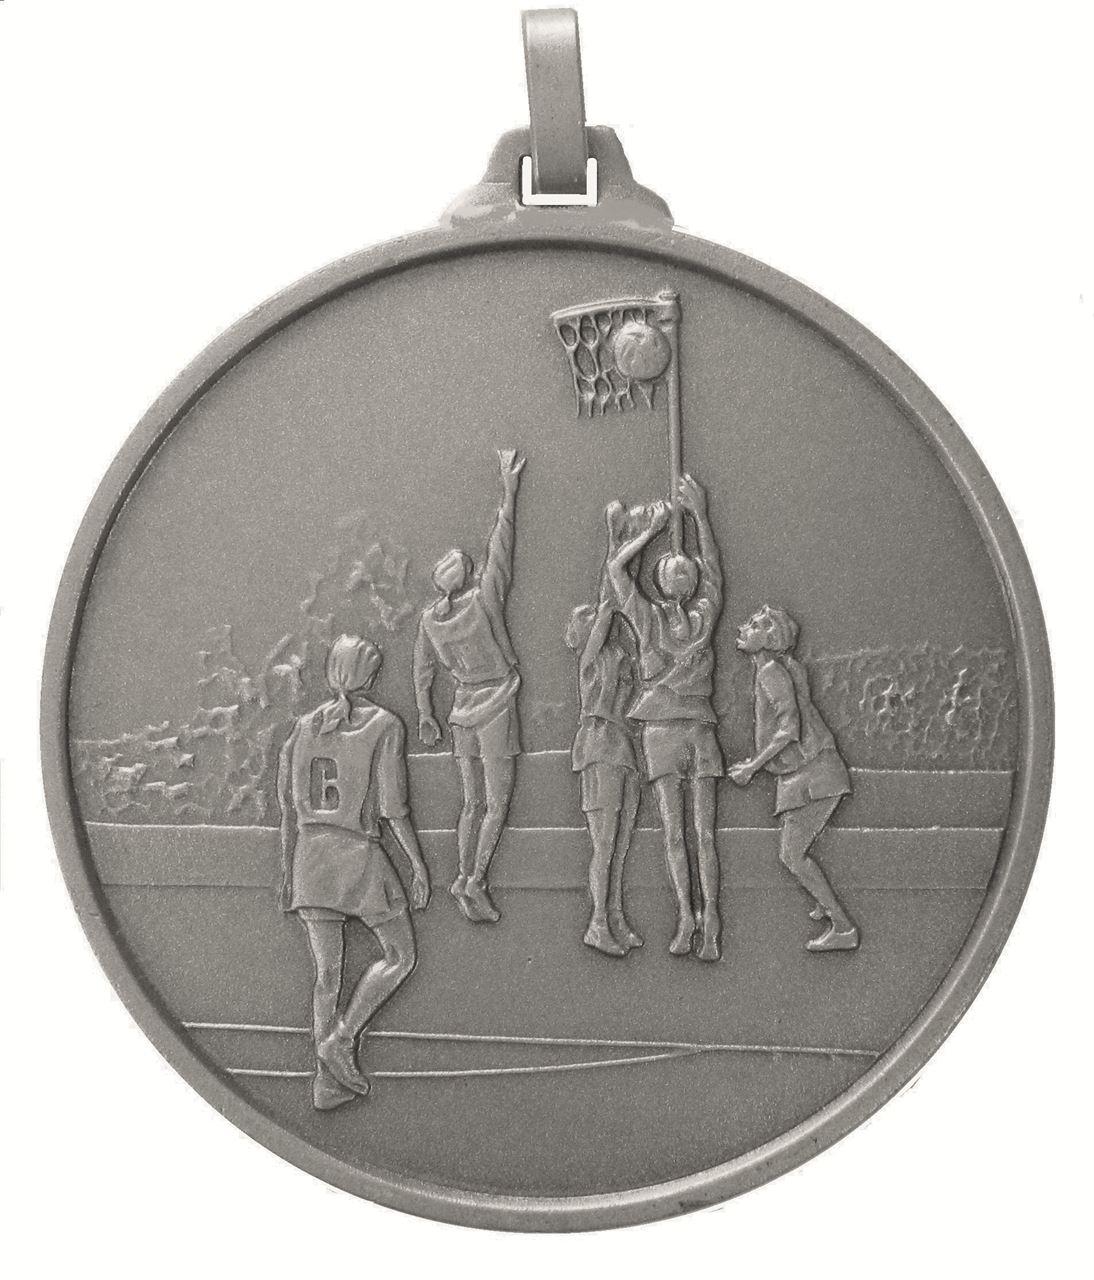 Silver Economy Netball Medal (size: 52mm) - 899E